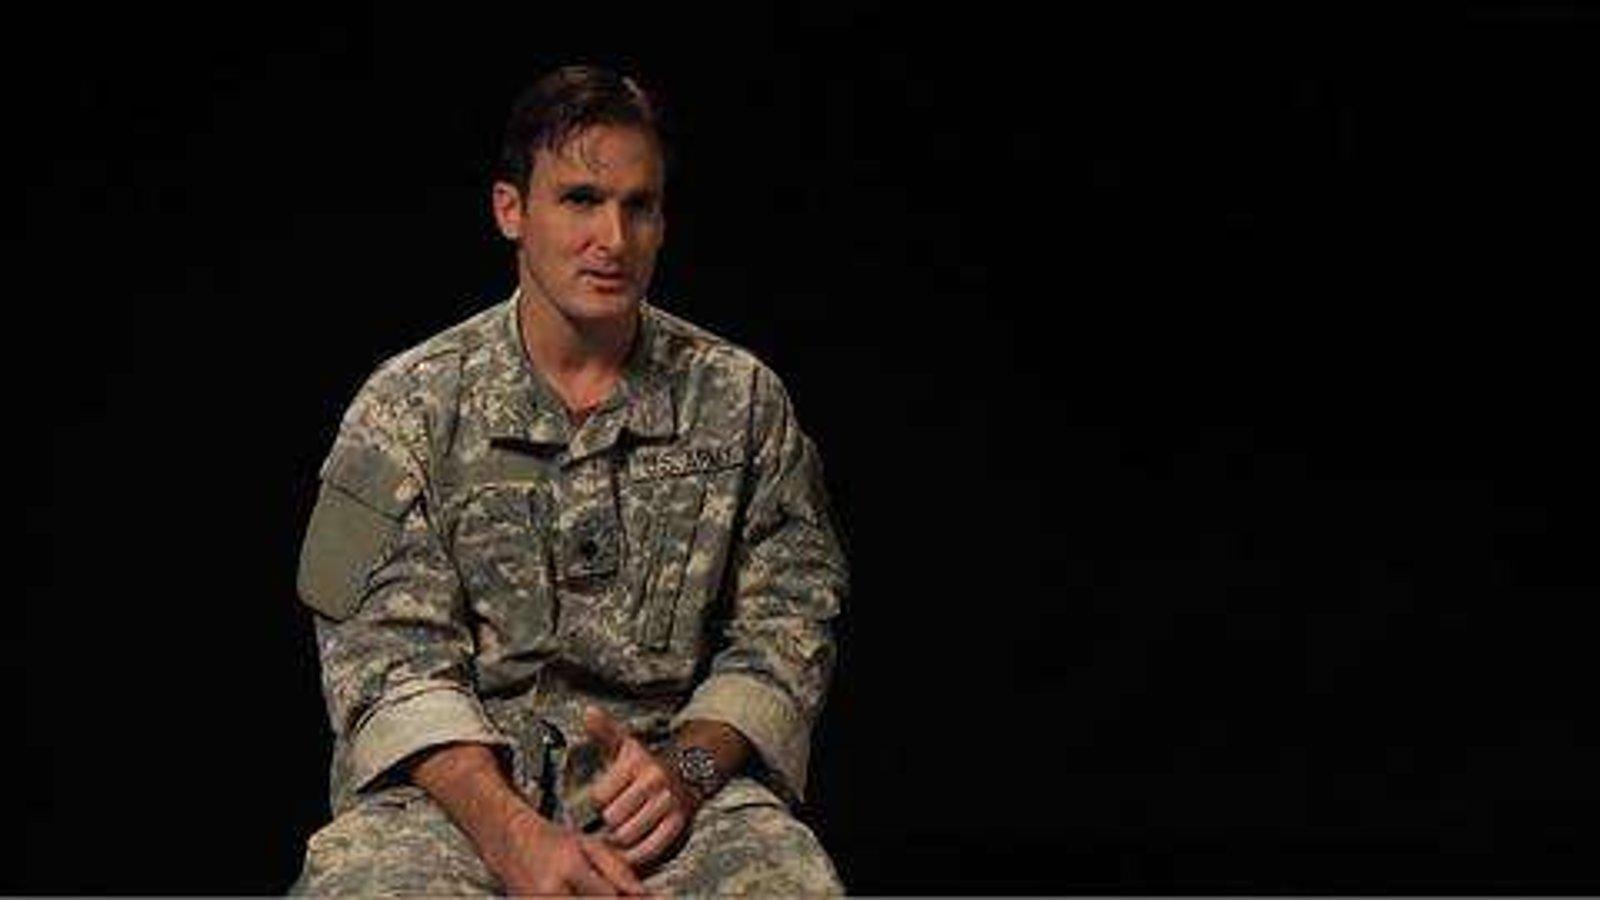 DSM 5 Guided Military Series, Vol. 1